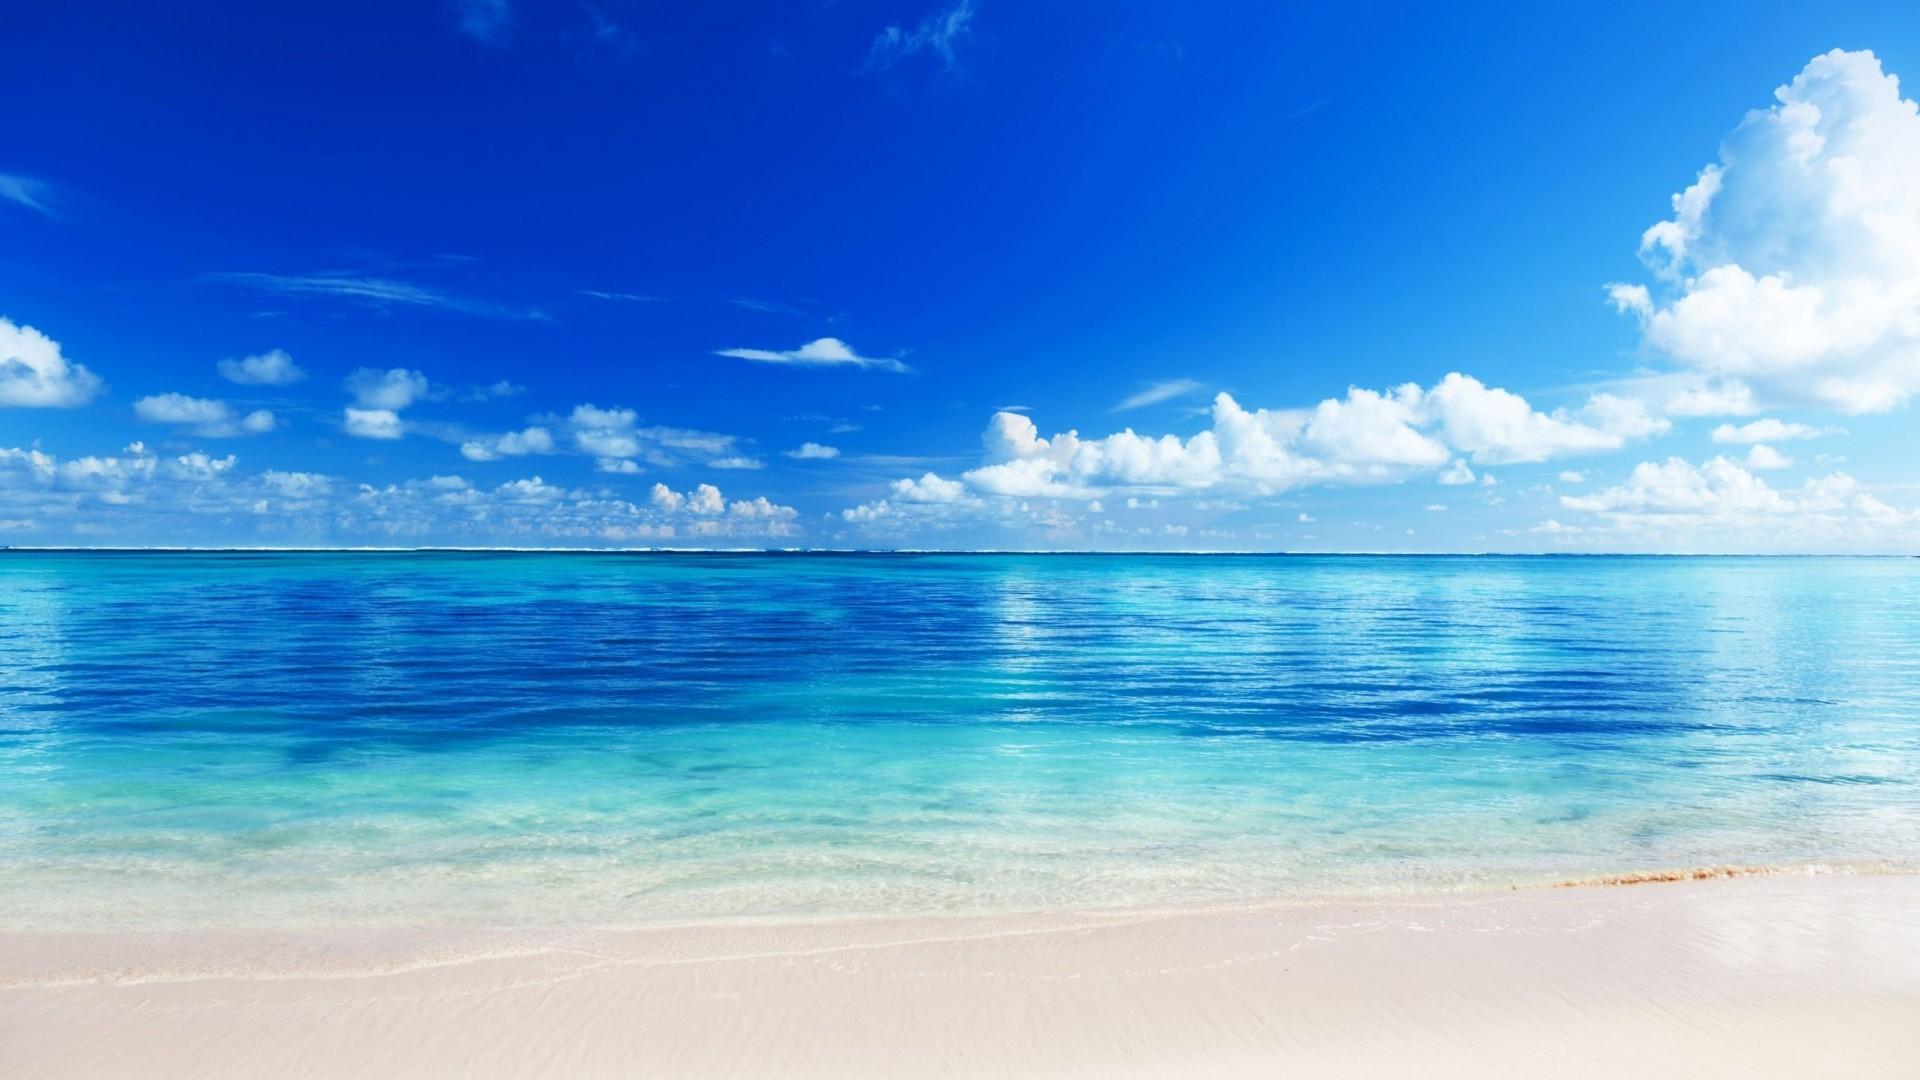 Wallpaper sea, beach, horizon, sand, tropics